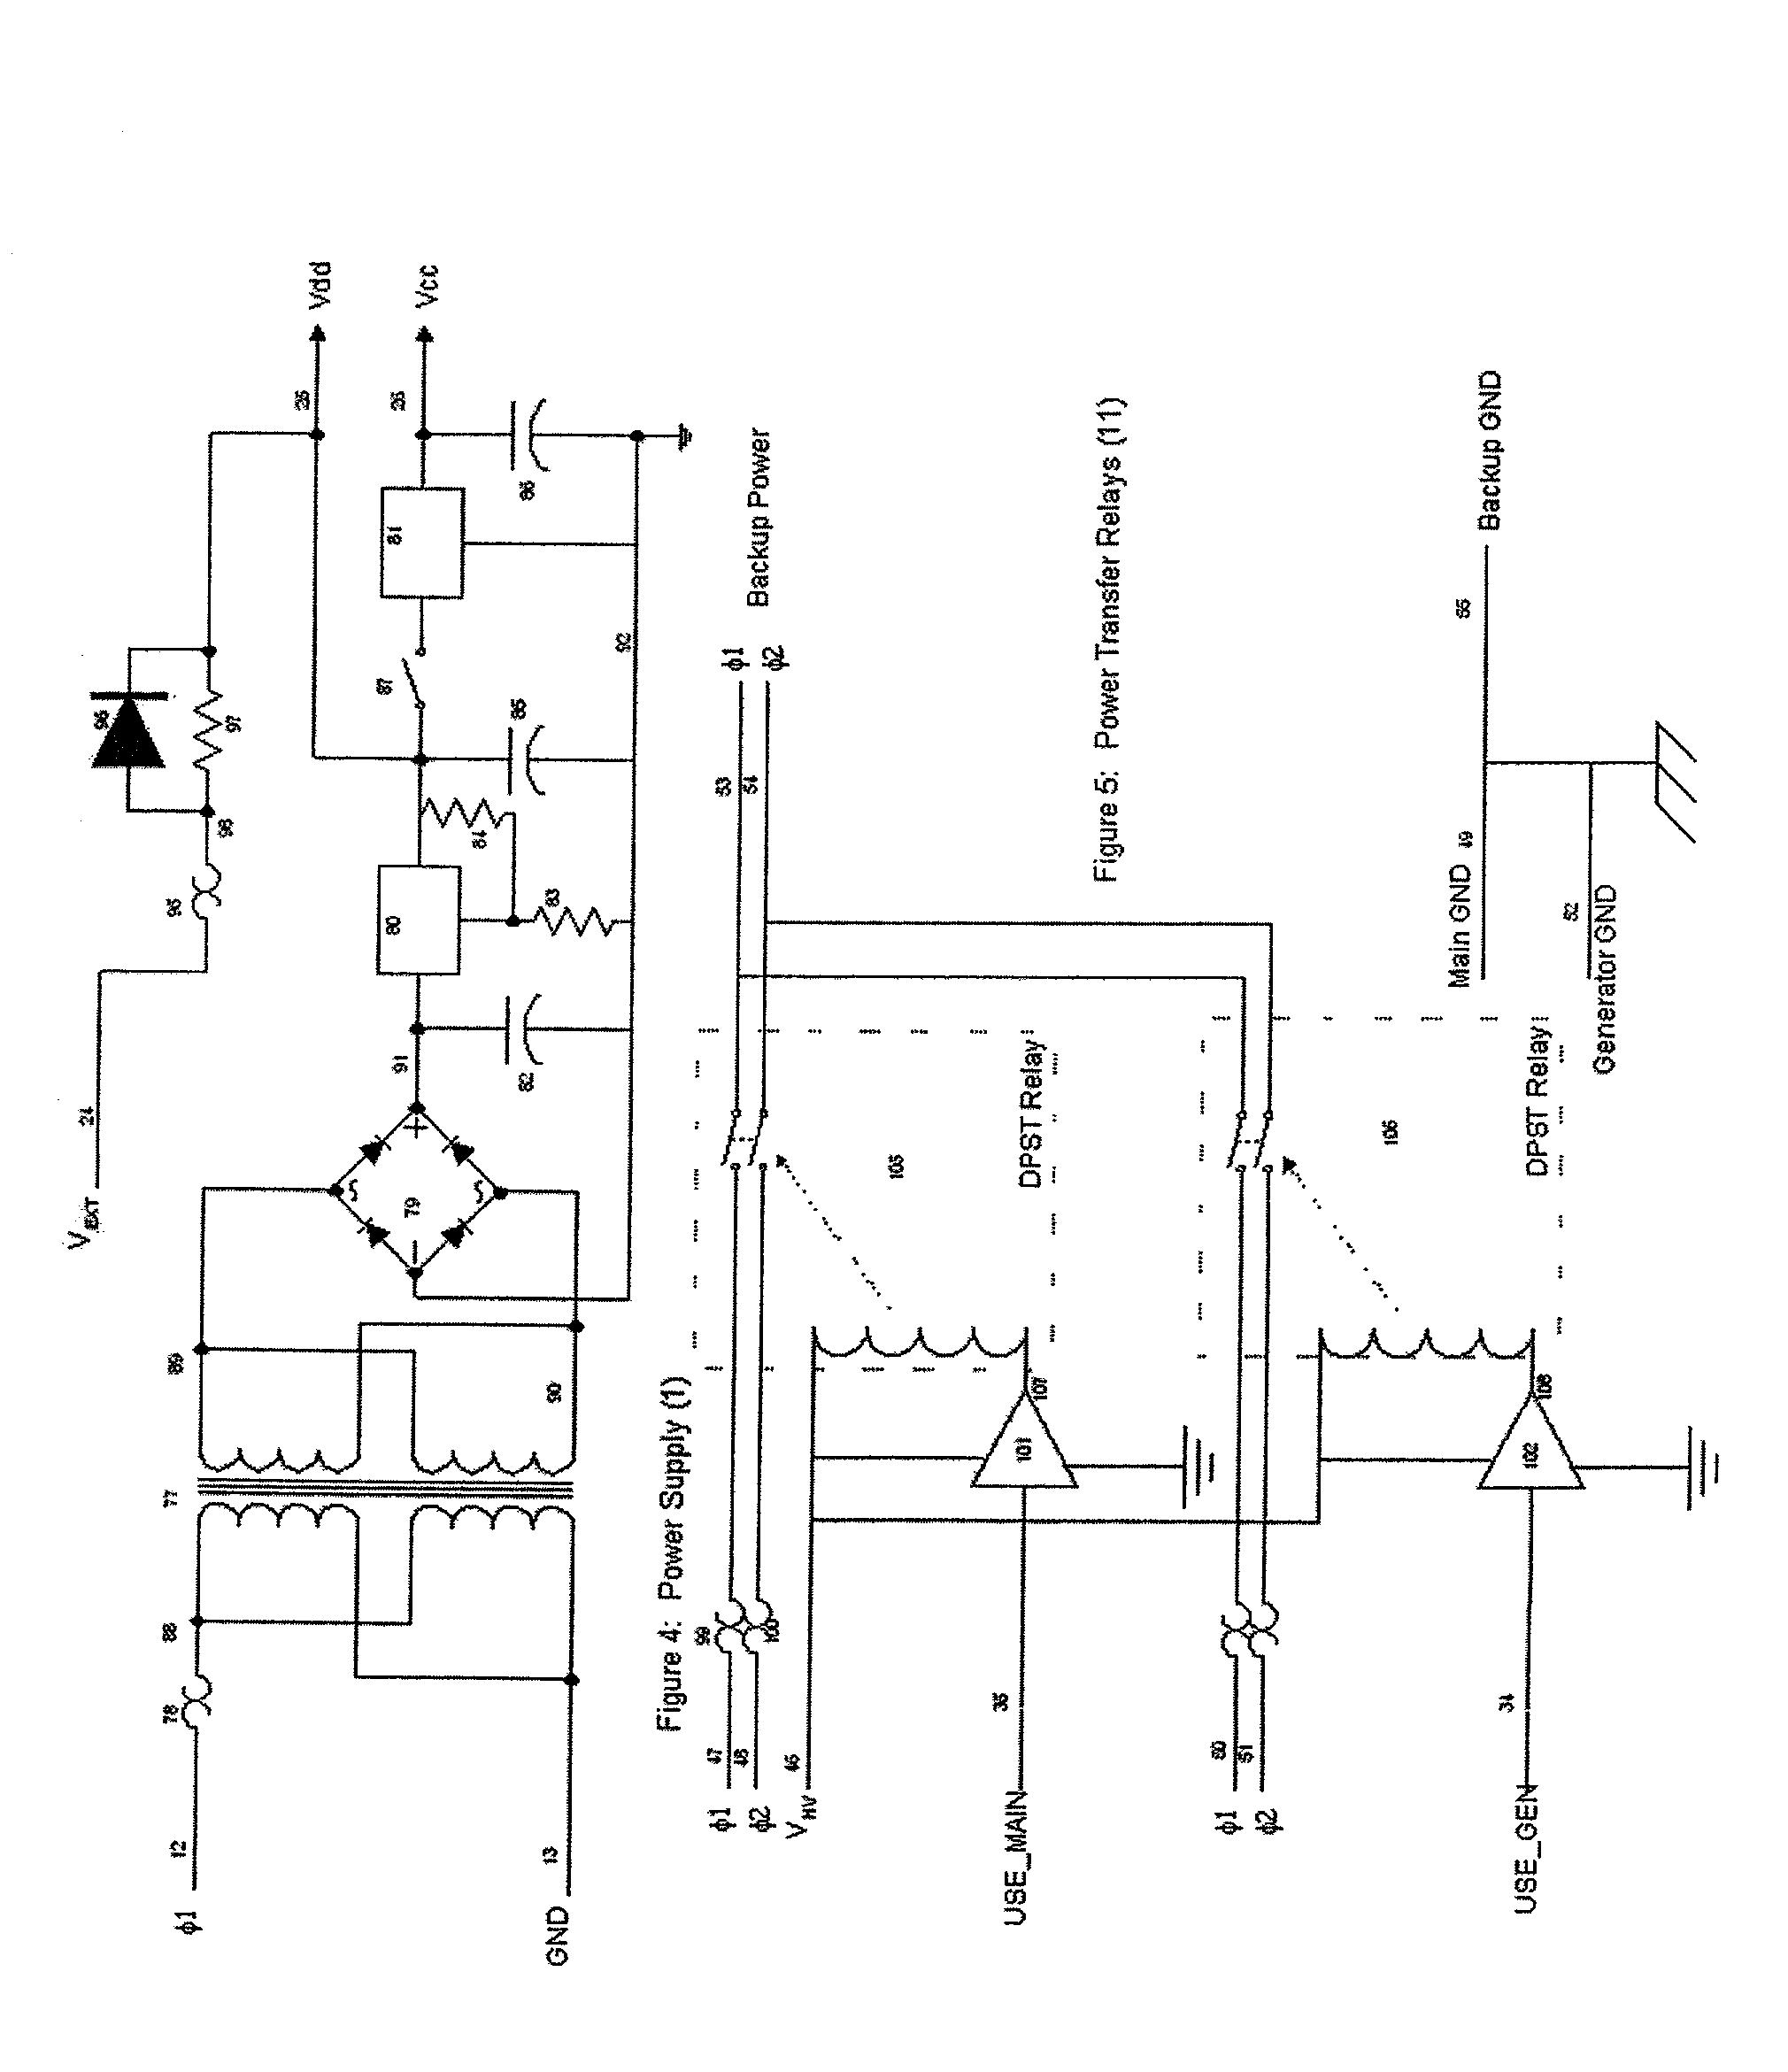 asco ats wiring diagram asco 962 wiring diagram wiring library  asco 962 wiring diagram wiring library